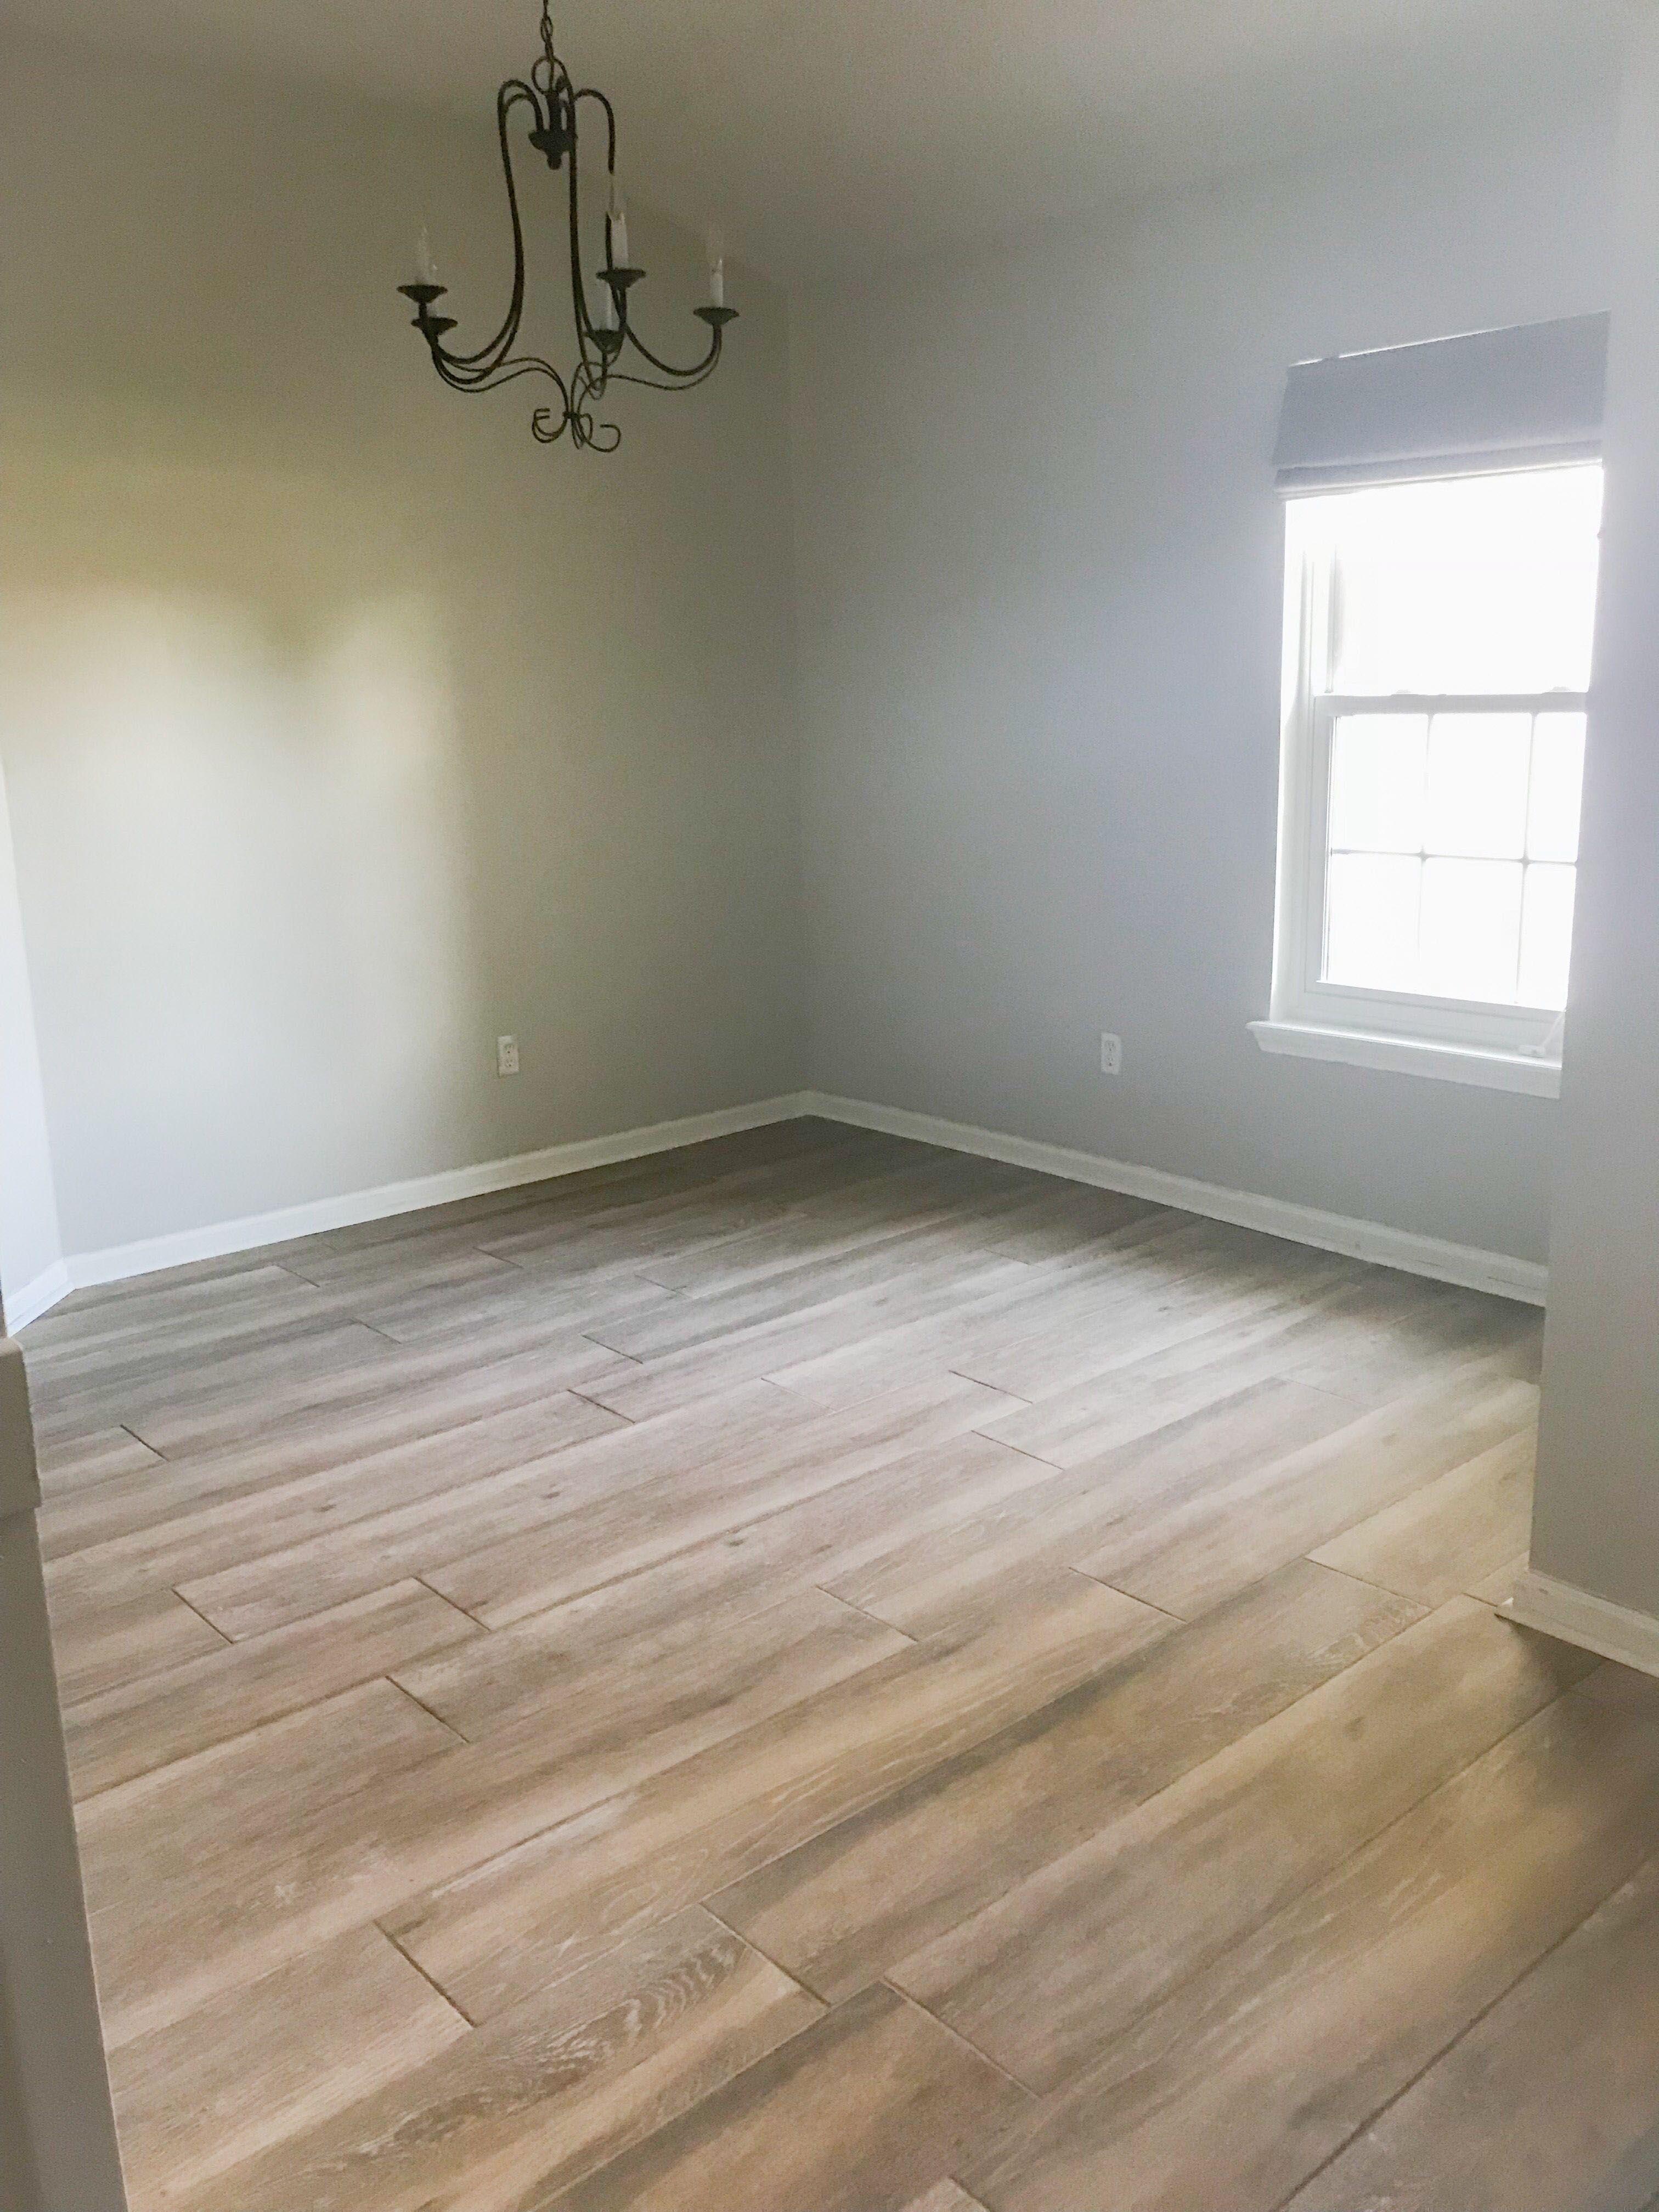 Hardwood Look Tile Floor Covering Assessments Absolute Best Brands Pros Vs Disadvantages Old Home Remodel Home Renovation Farmhouse Flooring